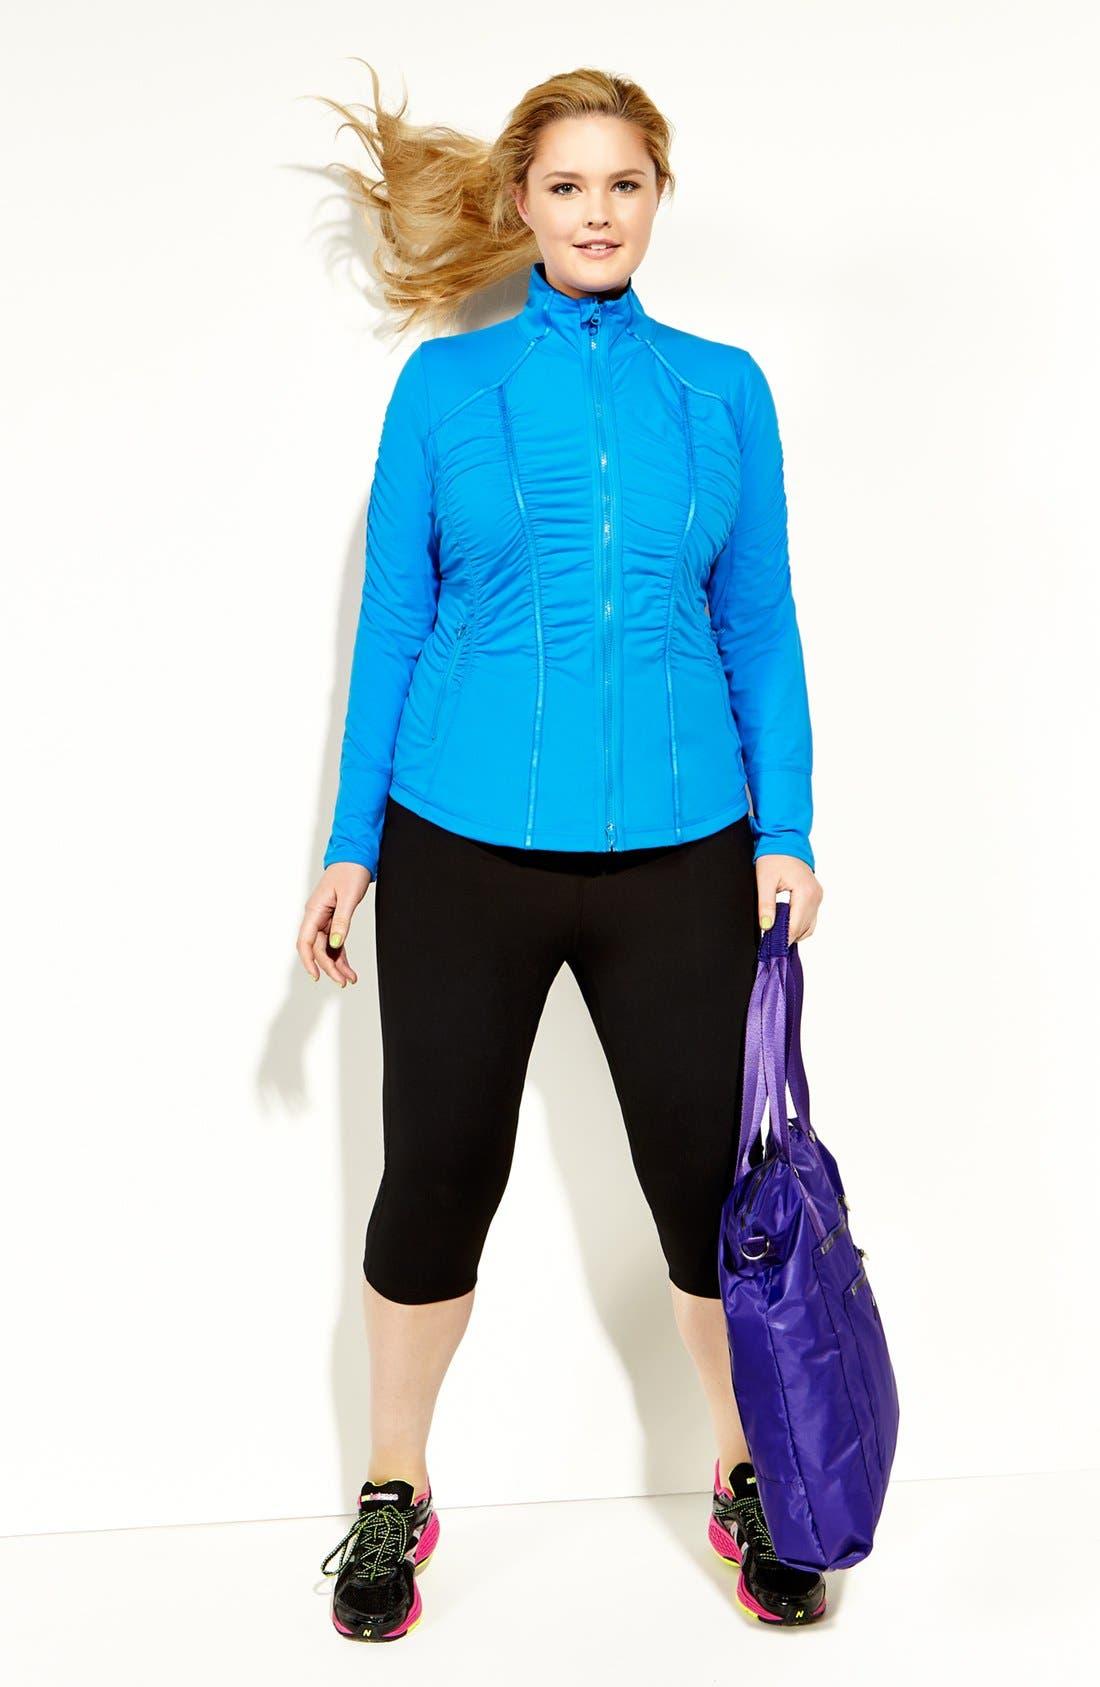 Alternate Image 1 Selected - Zella Jacket & Capri Pants